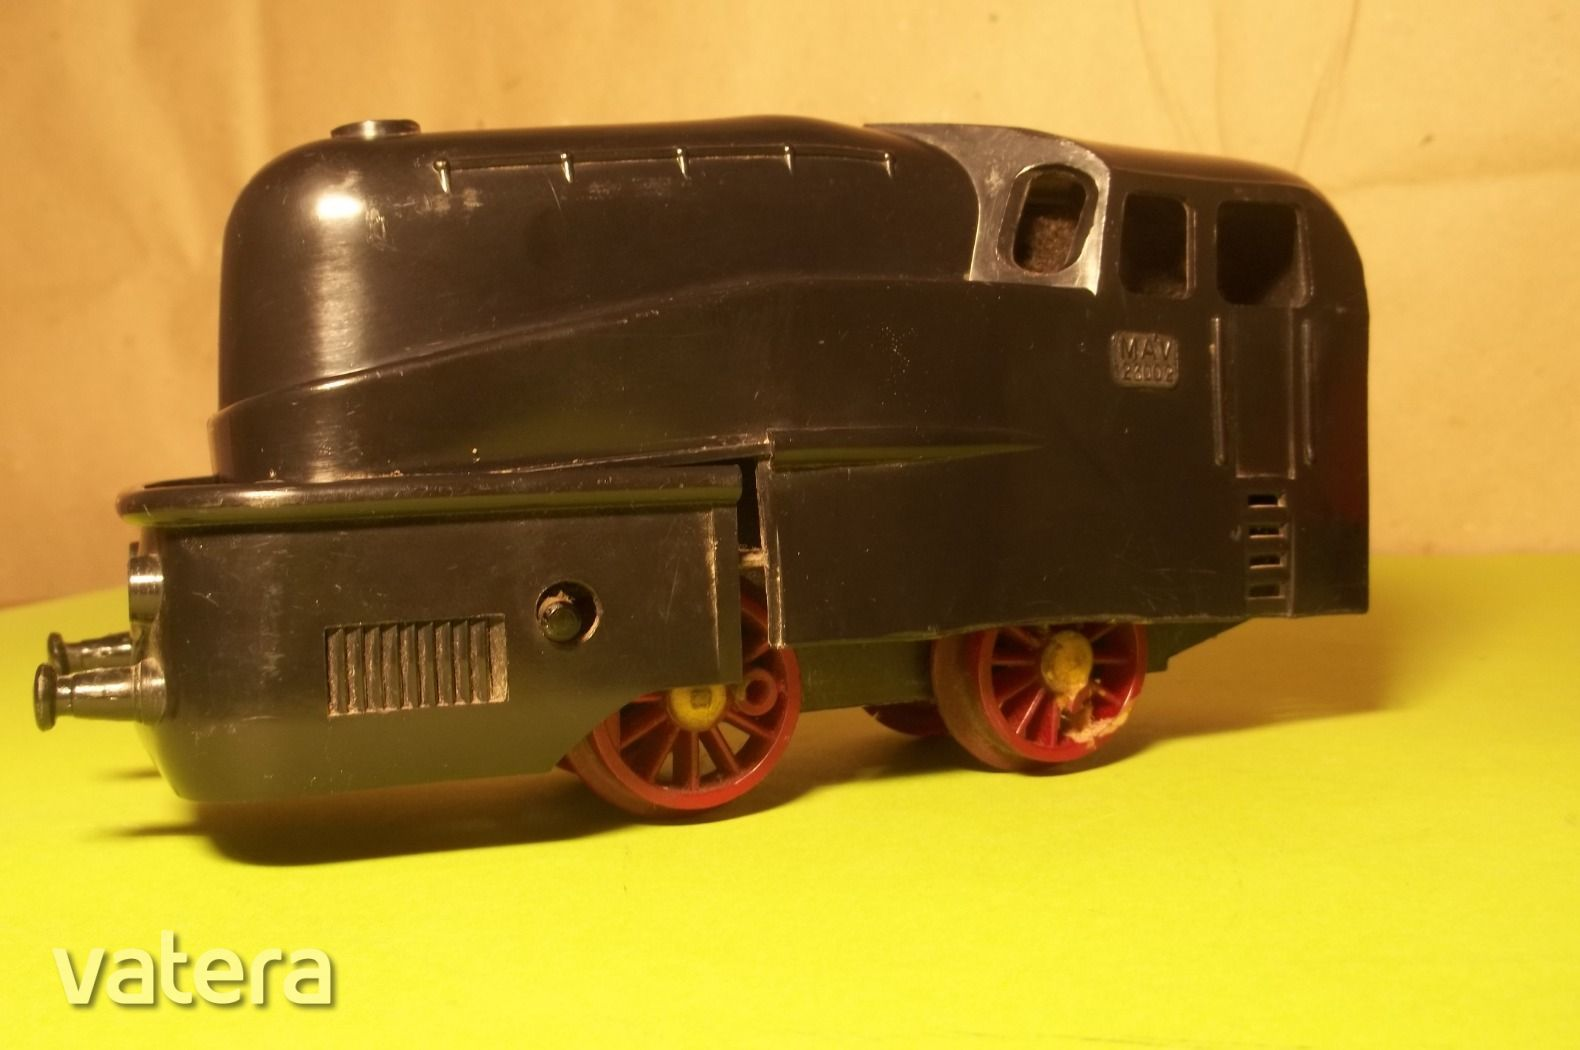 villam-kisvasut-mozdony-es-kocsik-gorgokeszito-ktsz-cb0b_1_big.jpg